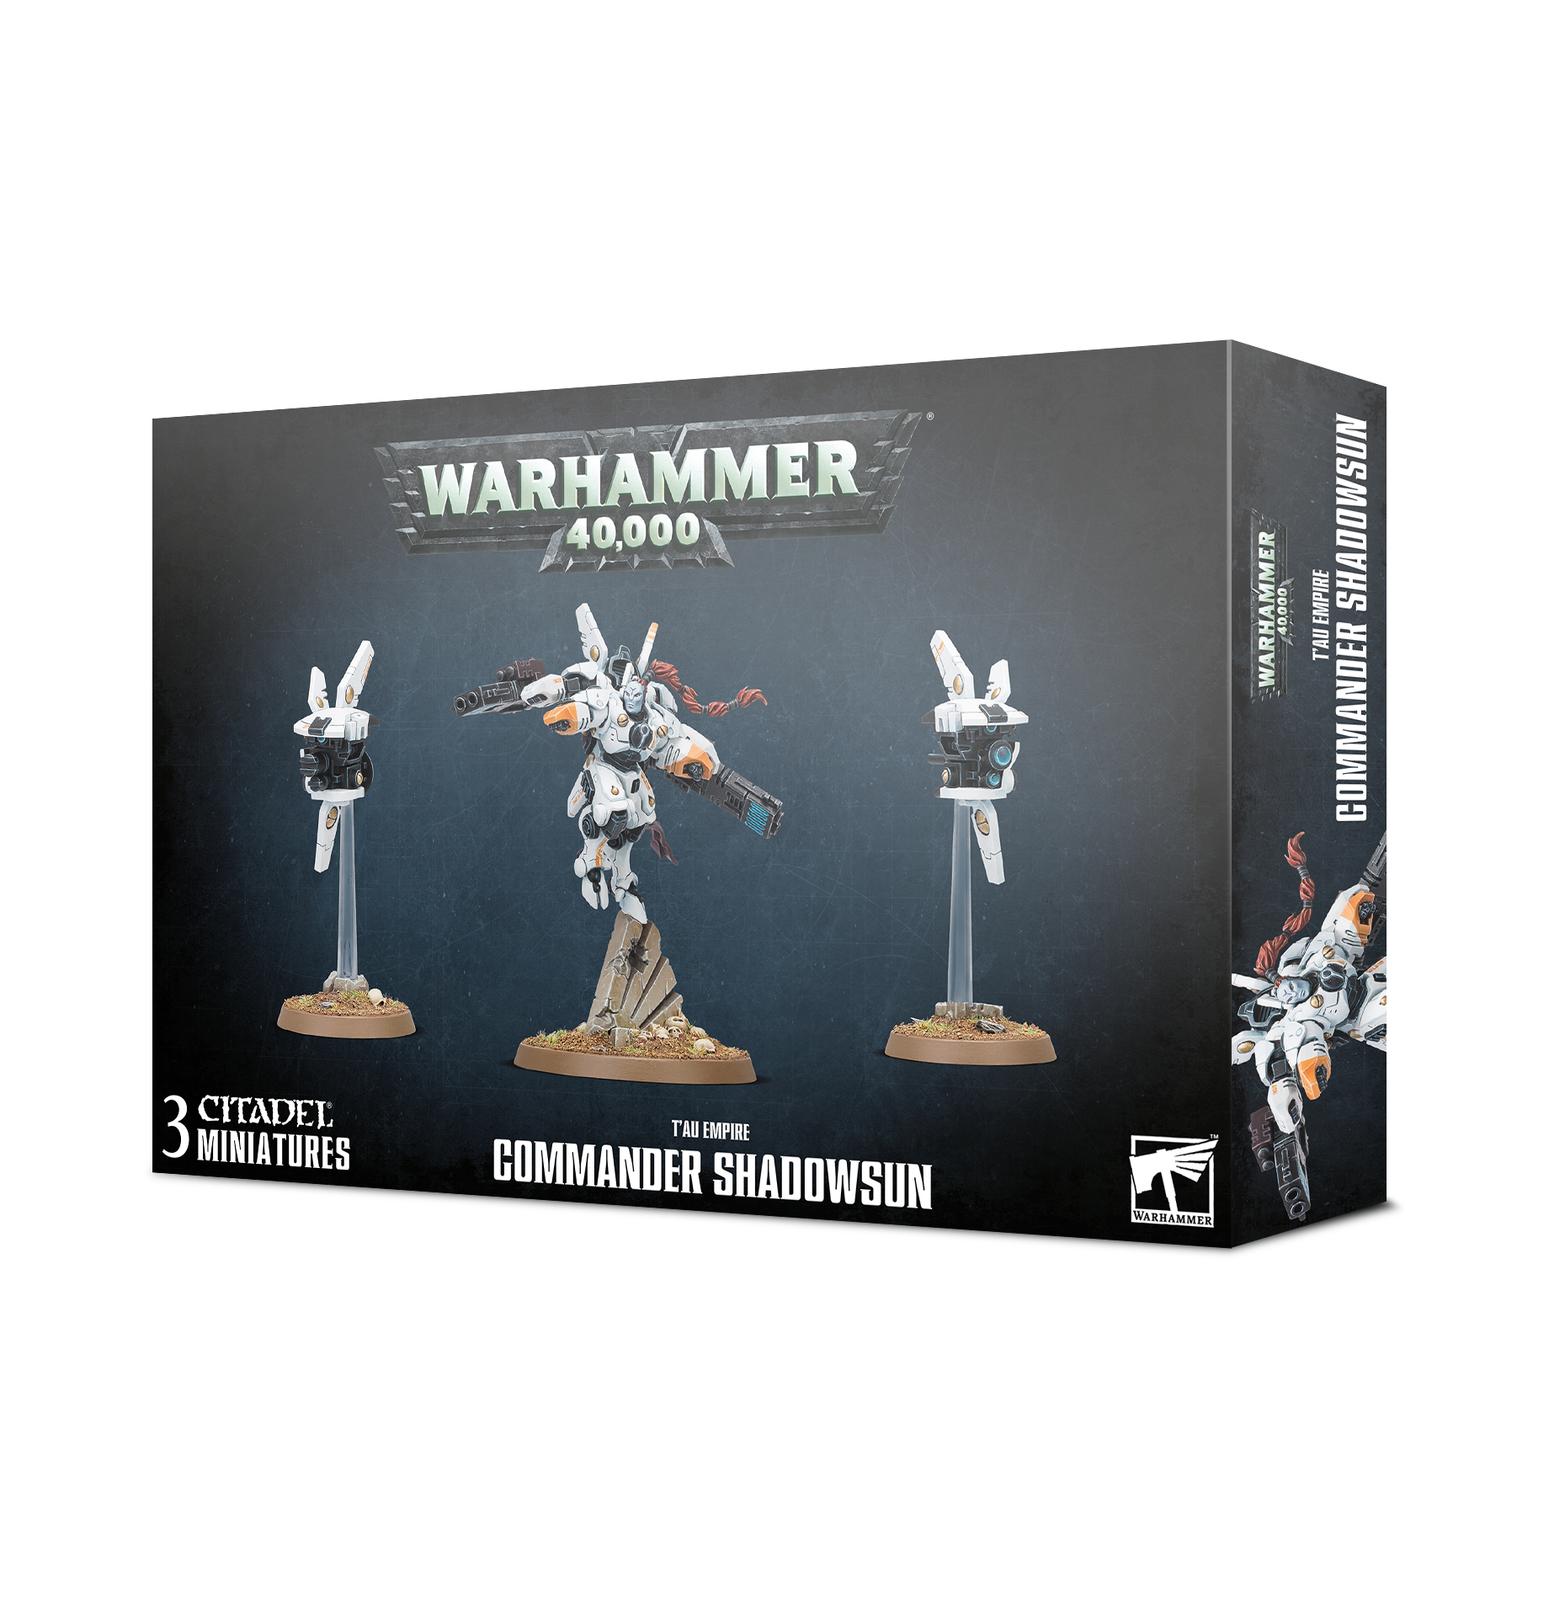 Warhammer 40,000 T'au Empire, Commander Shadowsun image